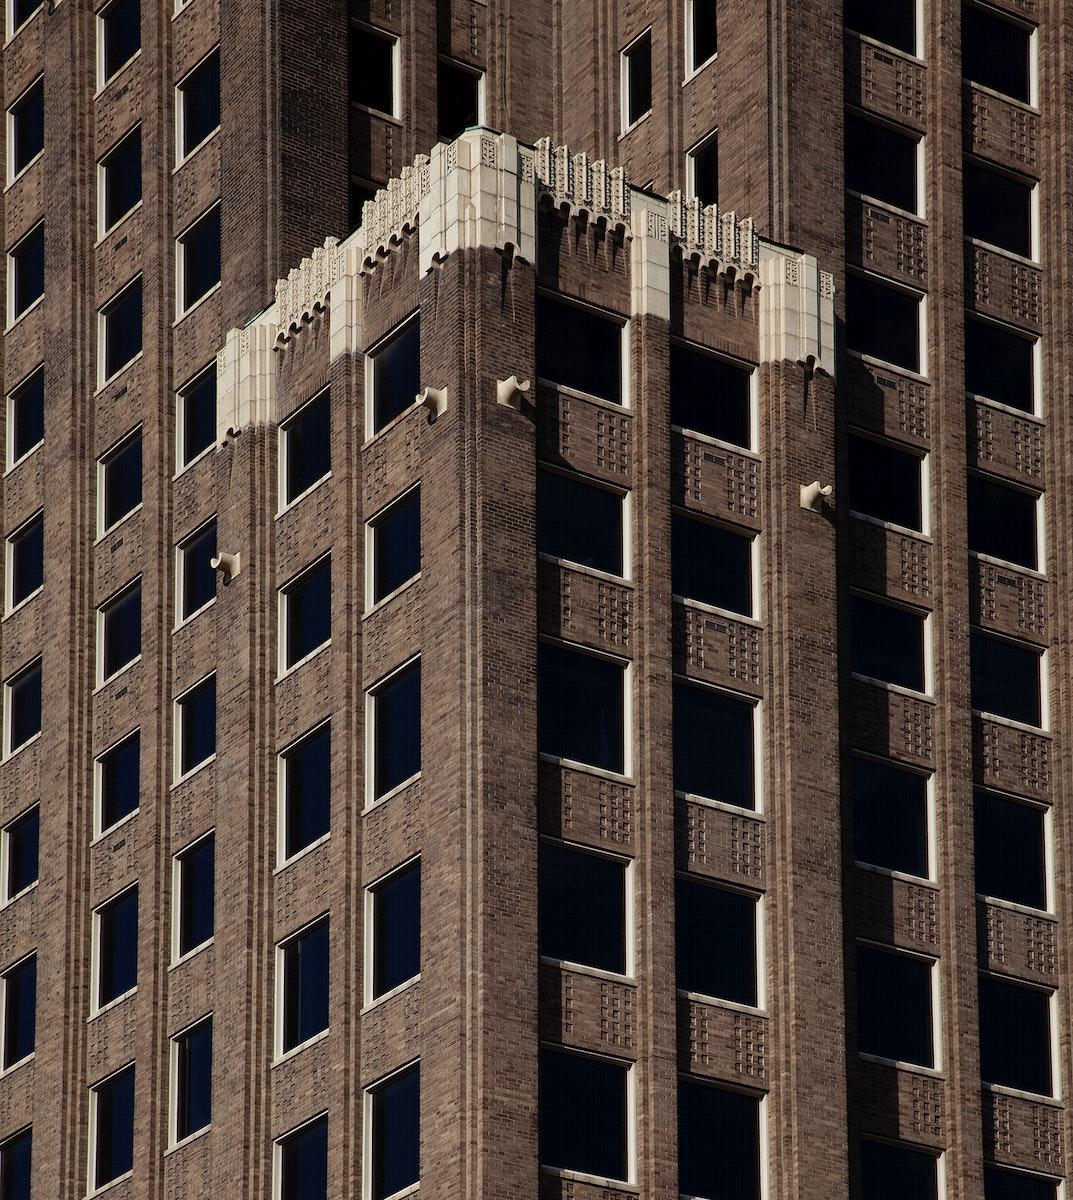 Building exterior, St. Louis, Missouri. Original image from Carol M. Highsmith's America, Library of Congress…